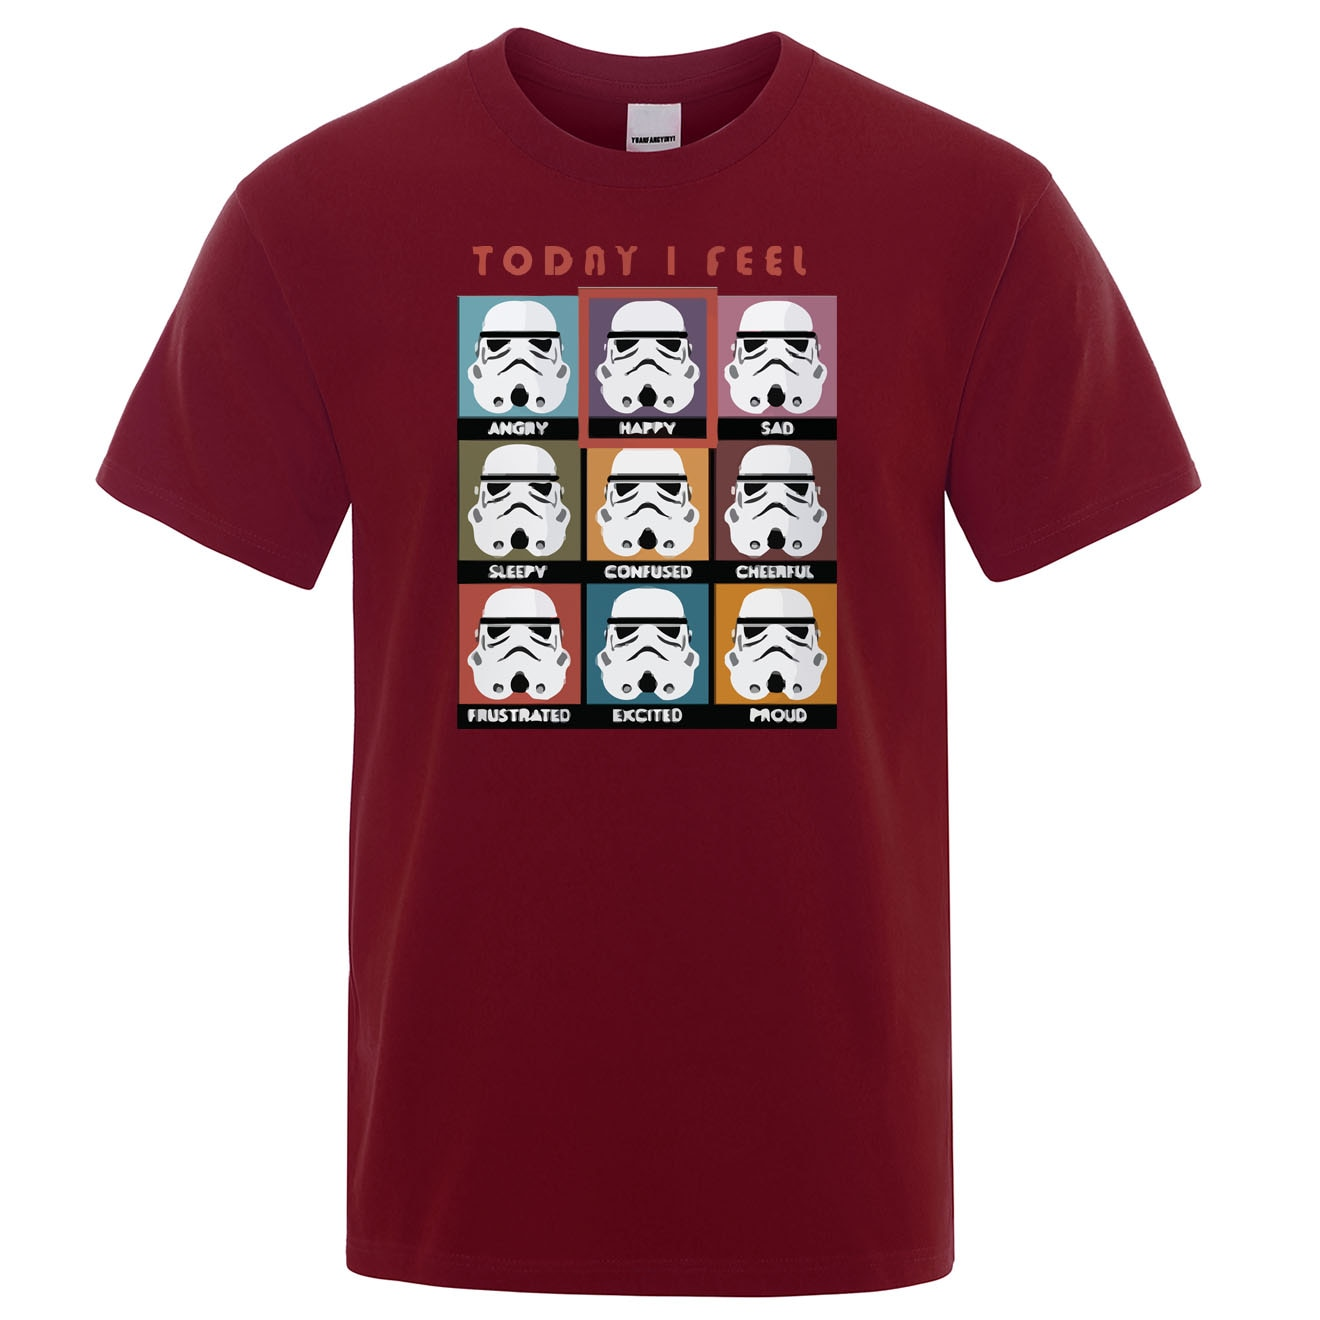 Camiseta I Fell Today Star Wars divertida camiseta estampada Stormtrooper Emotions hombres camiseta 2019 verano algodón Hip Hop Harajuku Top Tees